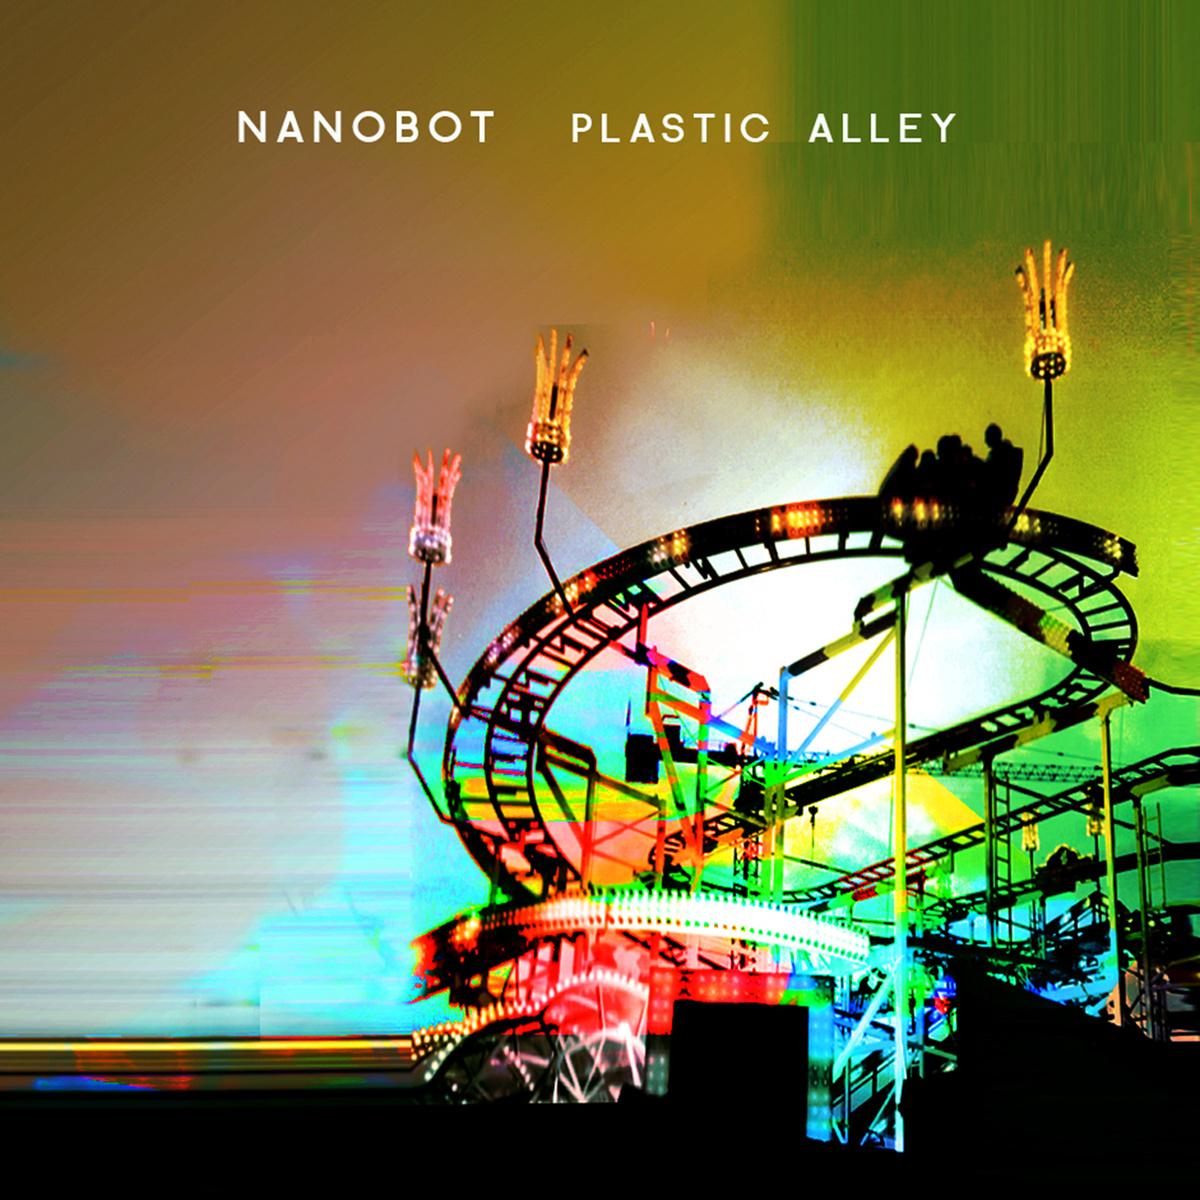 Nanobot Plastic Alley